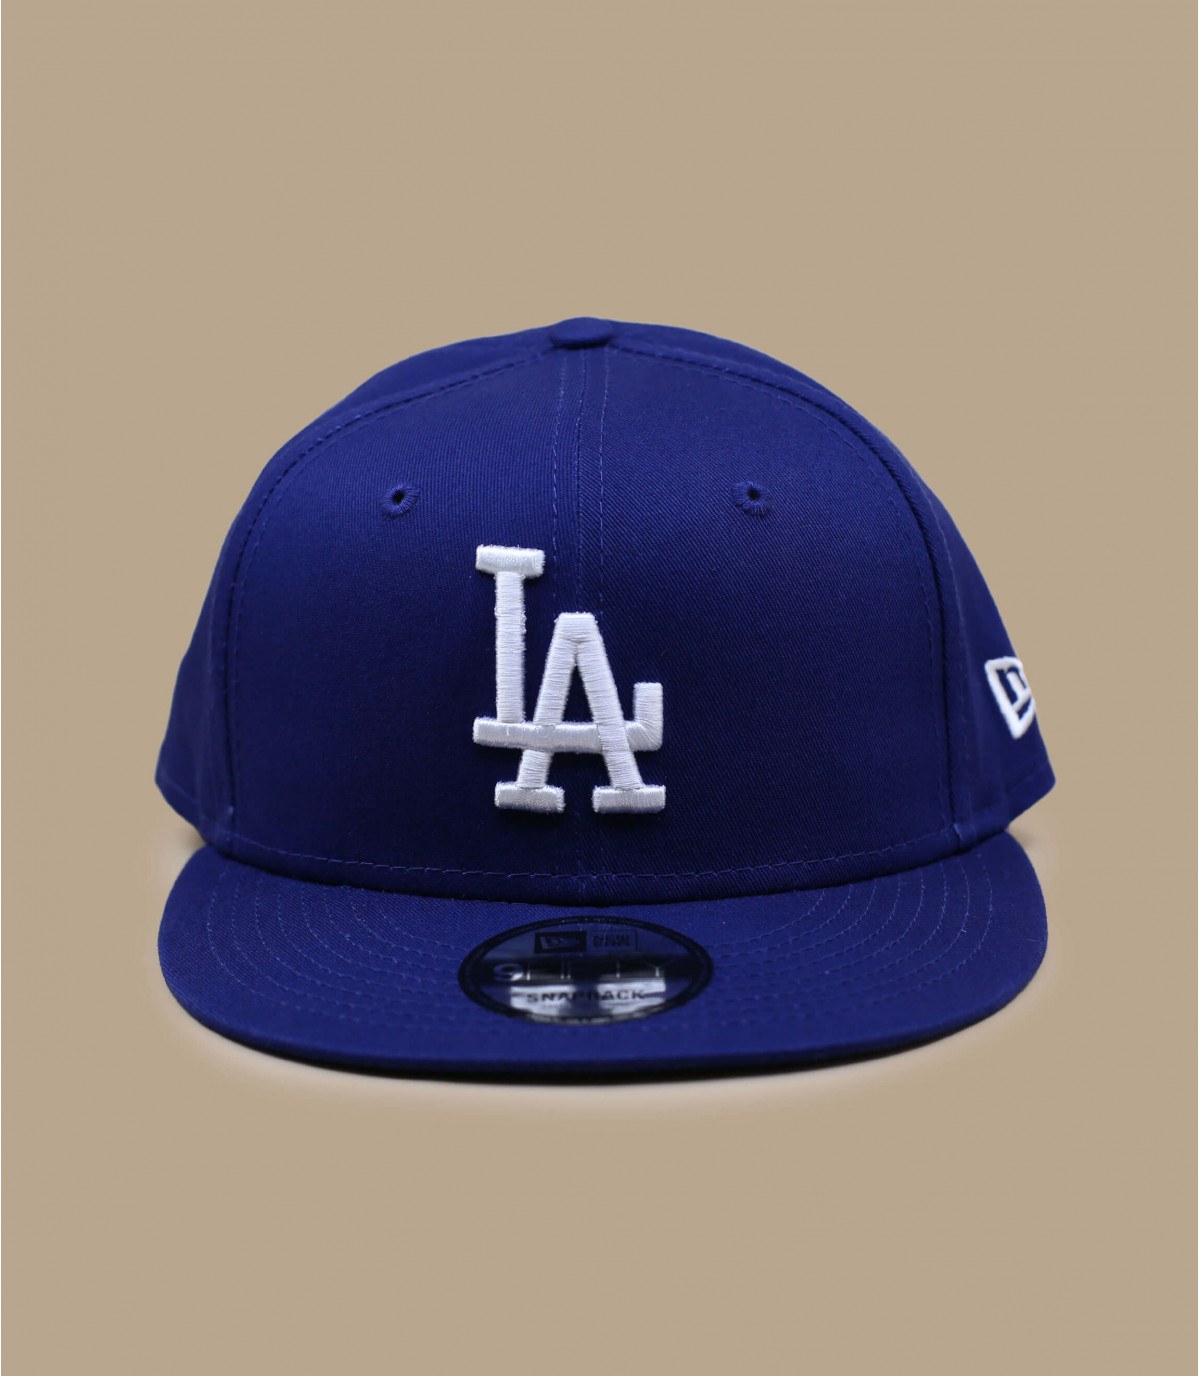 Details Snapback LA team - afbeeling 2